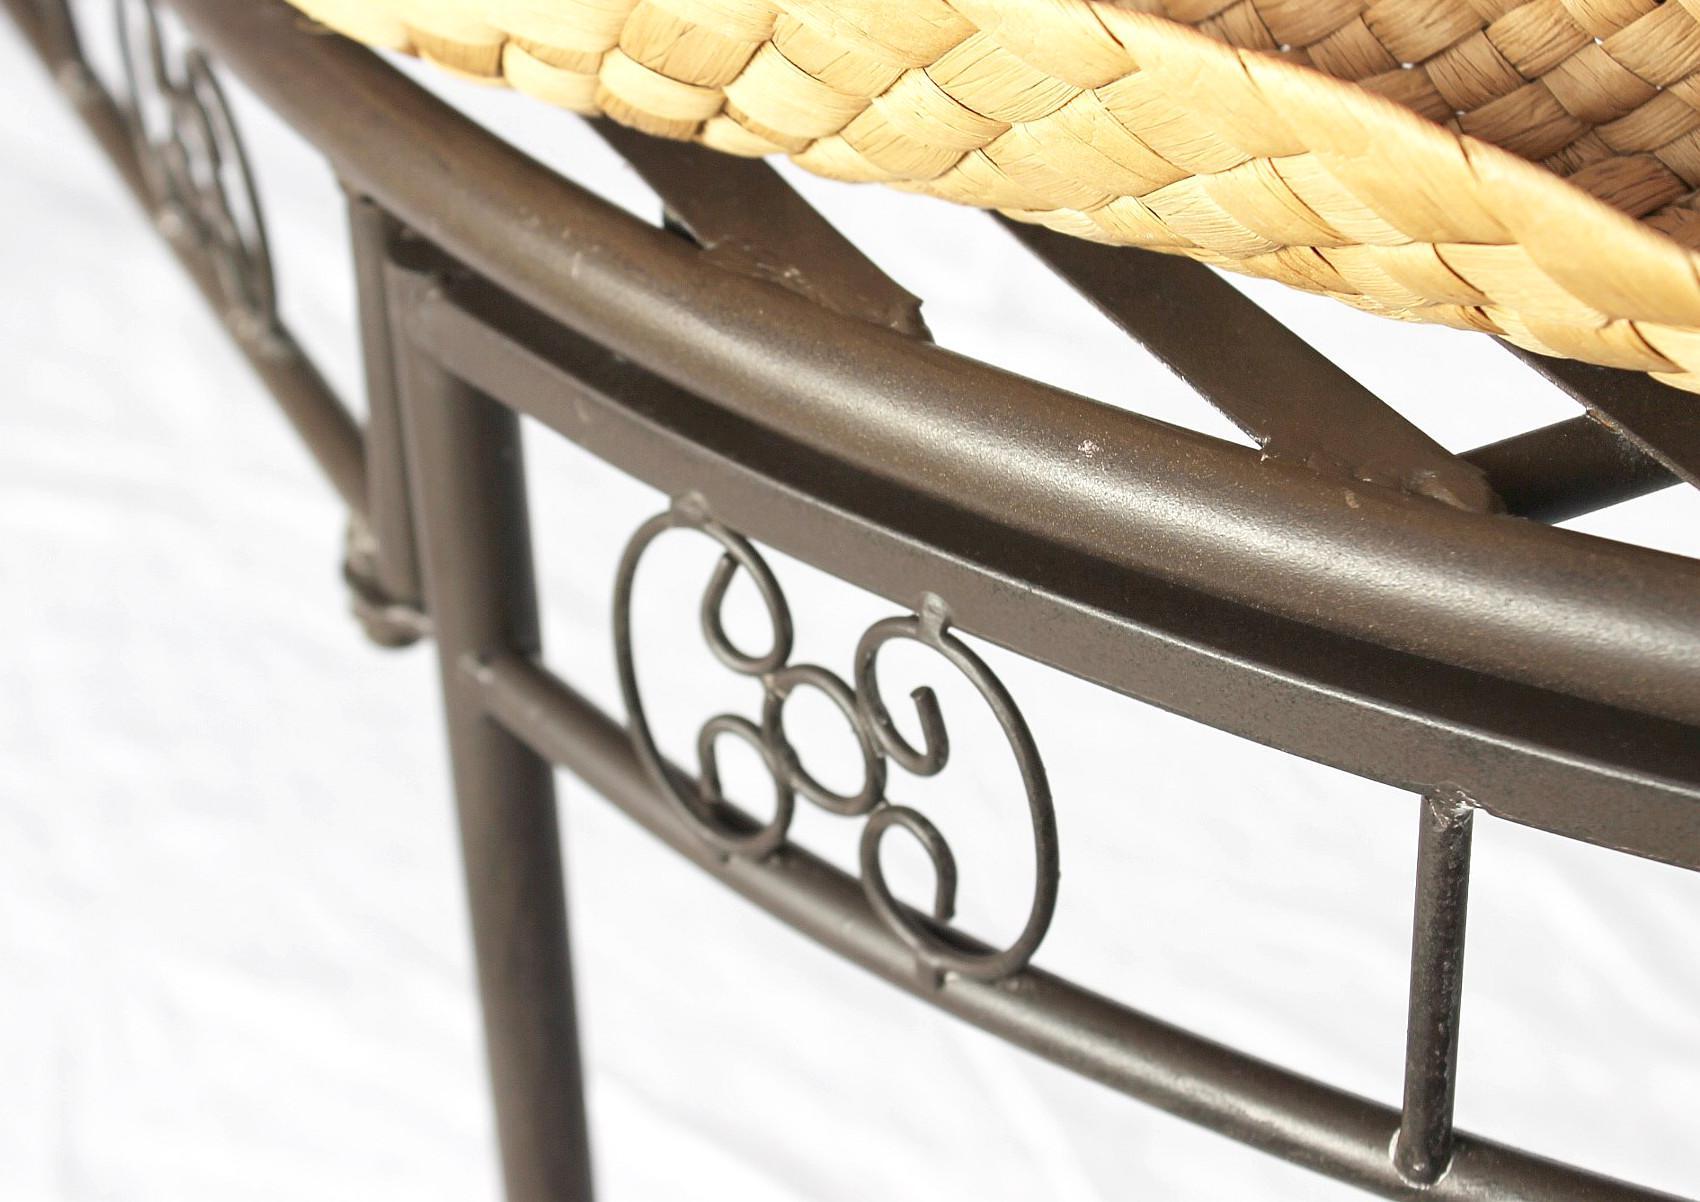 dandibo gartenbank wetterfest aus metall bank sitzbank 2 sitzer dy140486 braun 120 cm. Black Bedroom Furniture Sets. Home Design Ideas